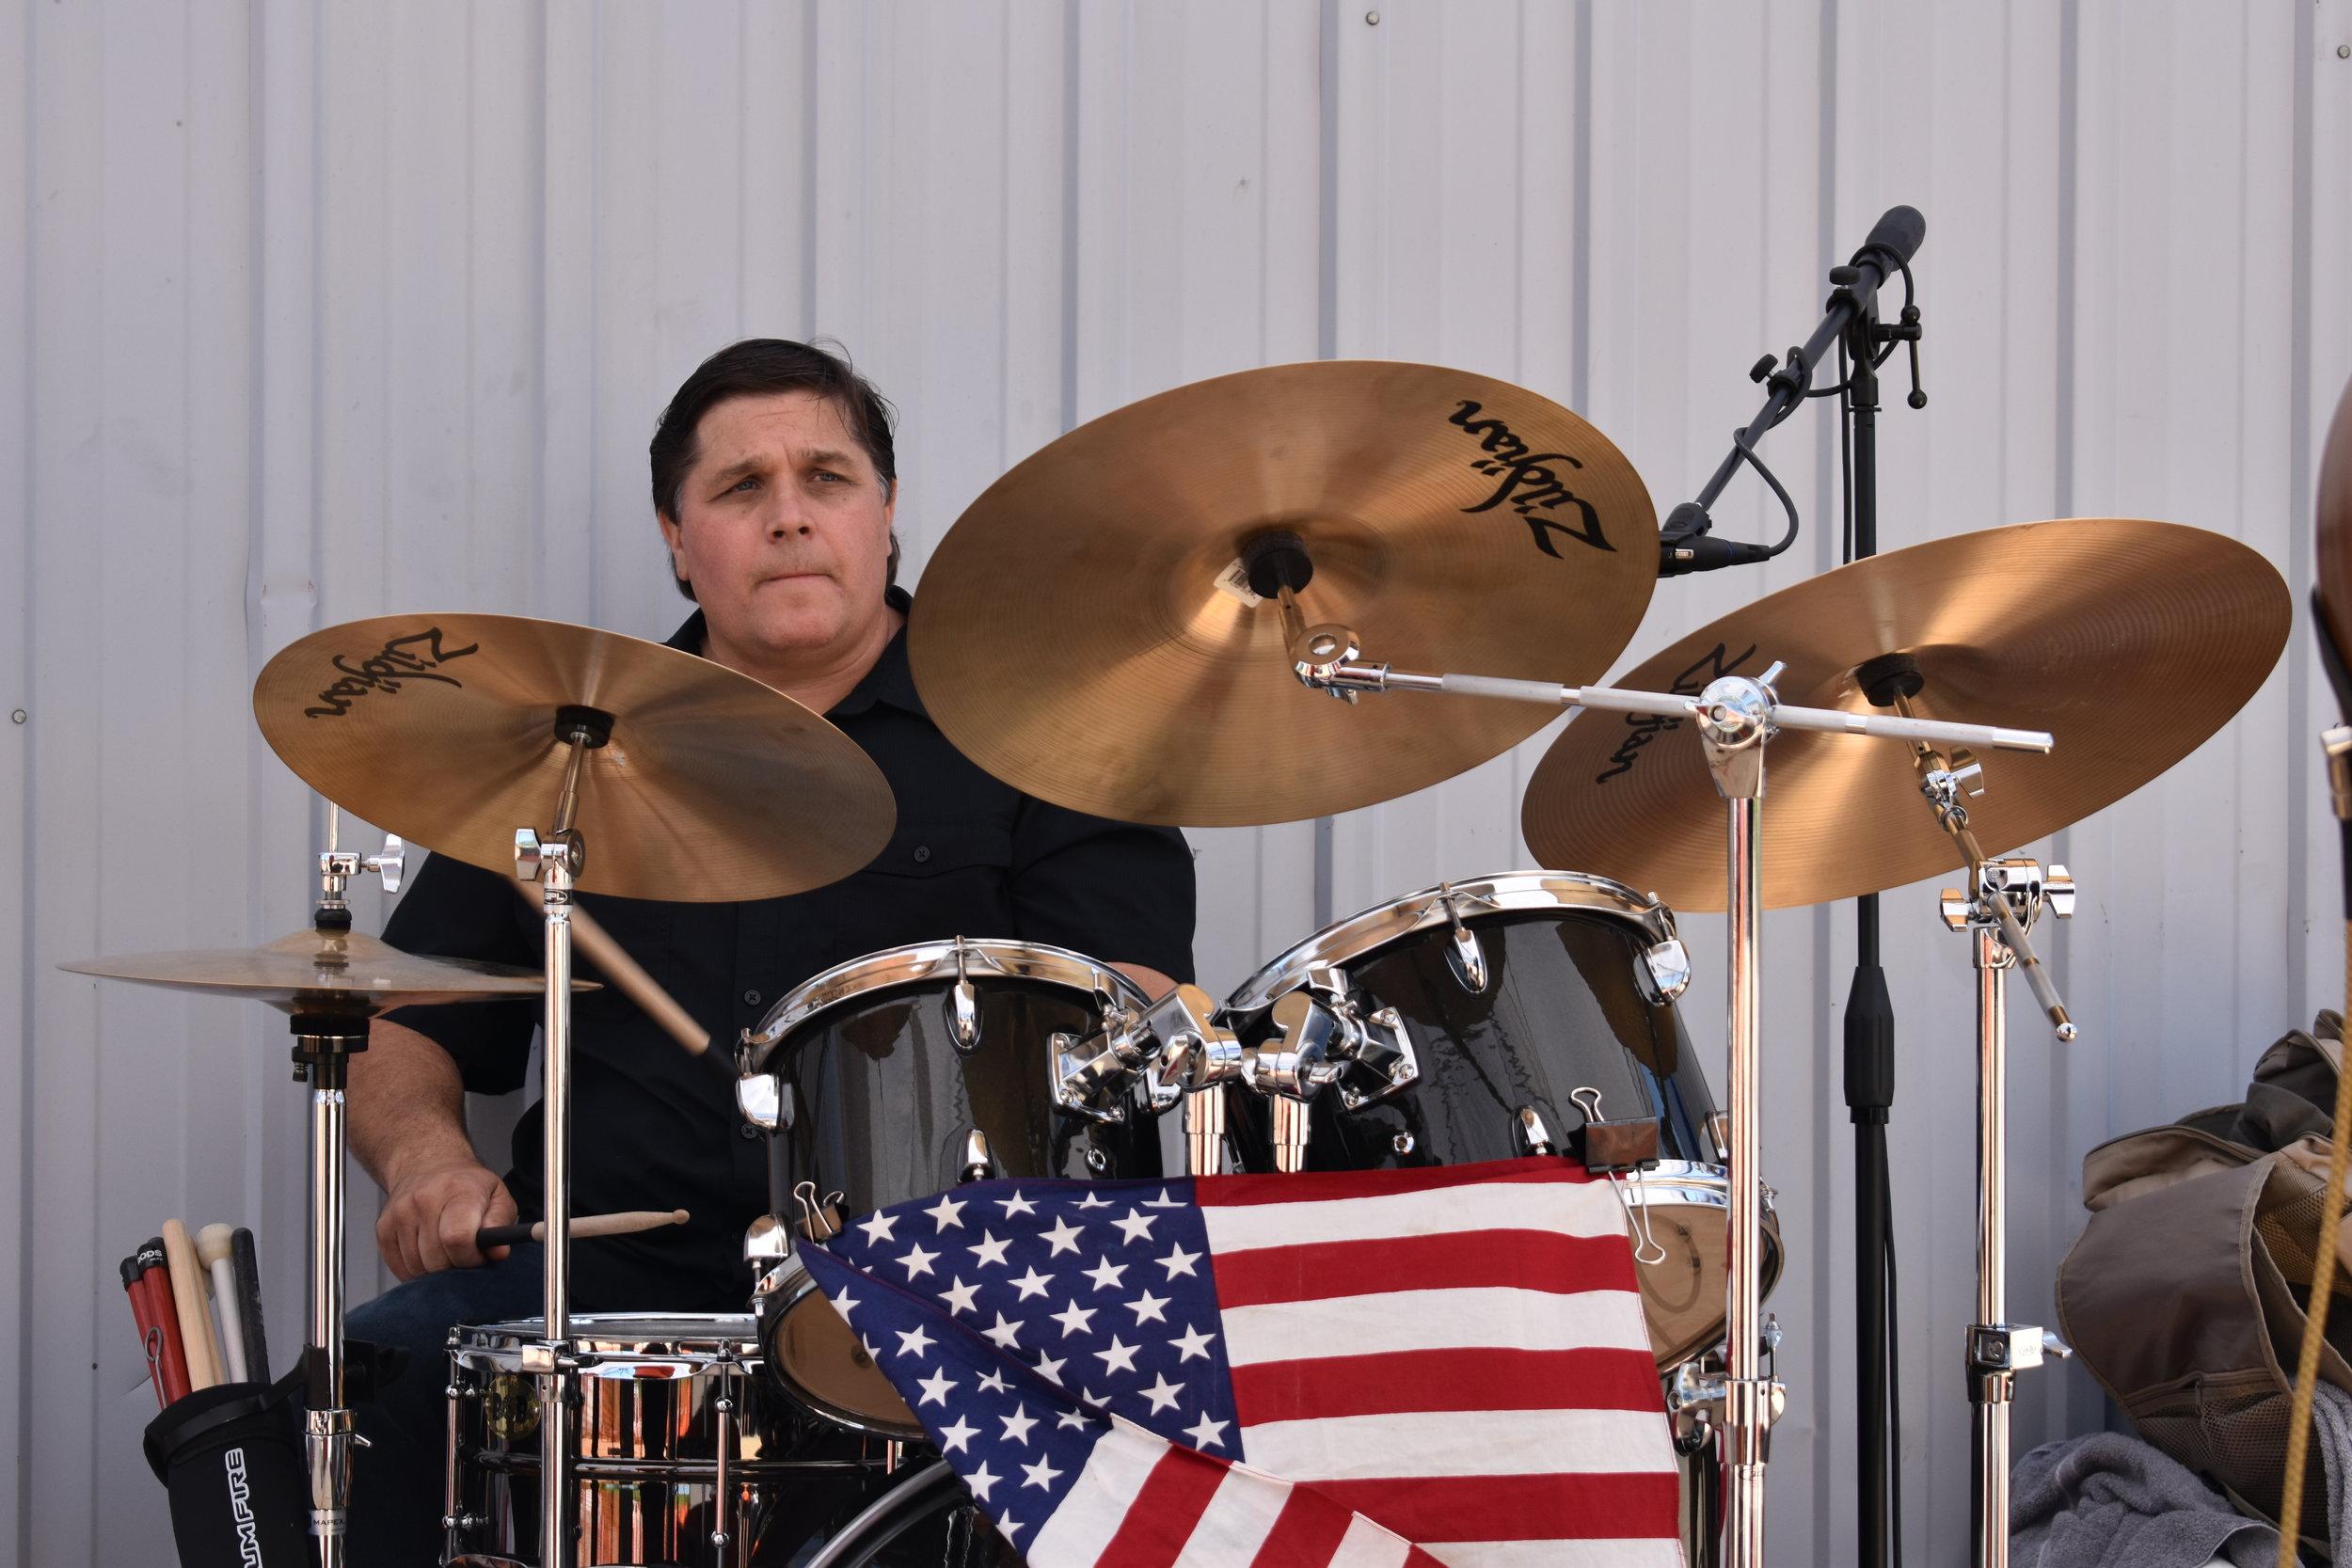 And of course their drummer, Joe Sukana